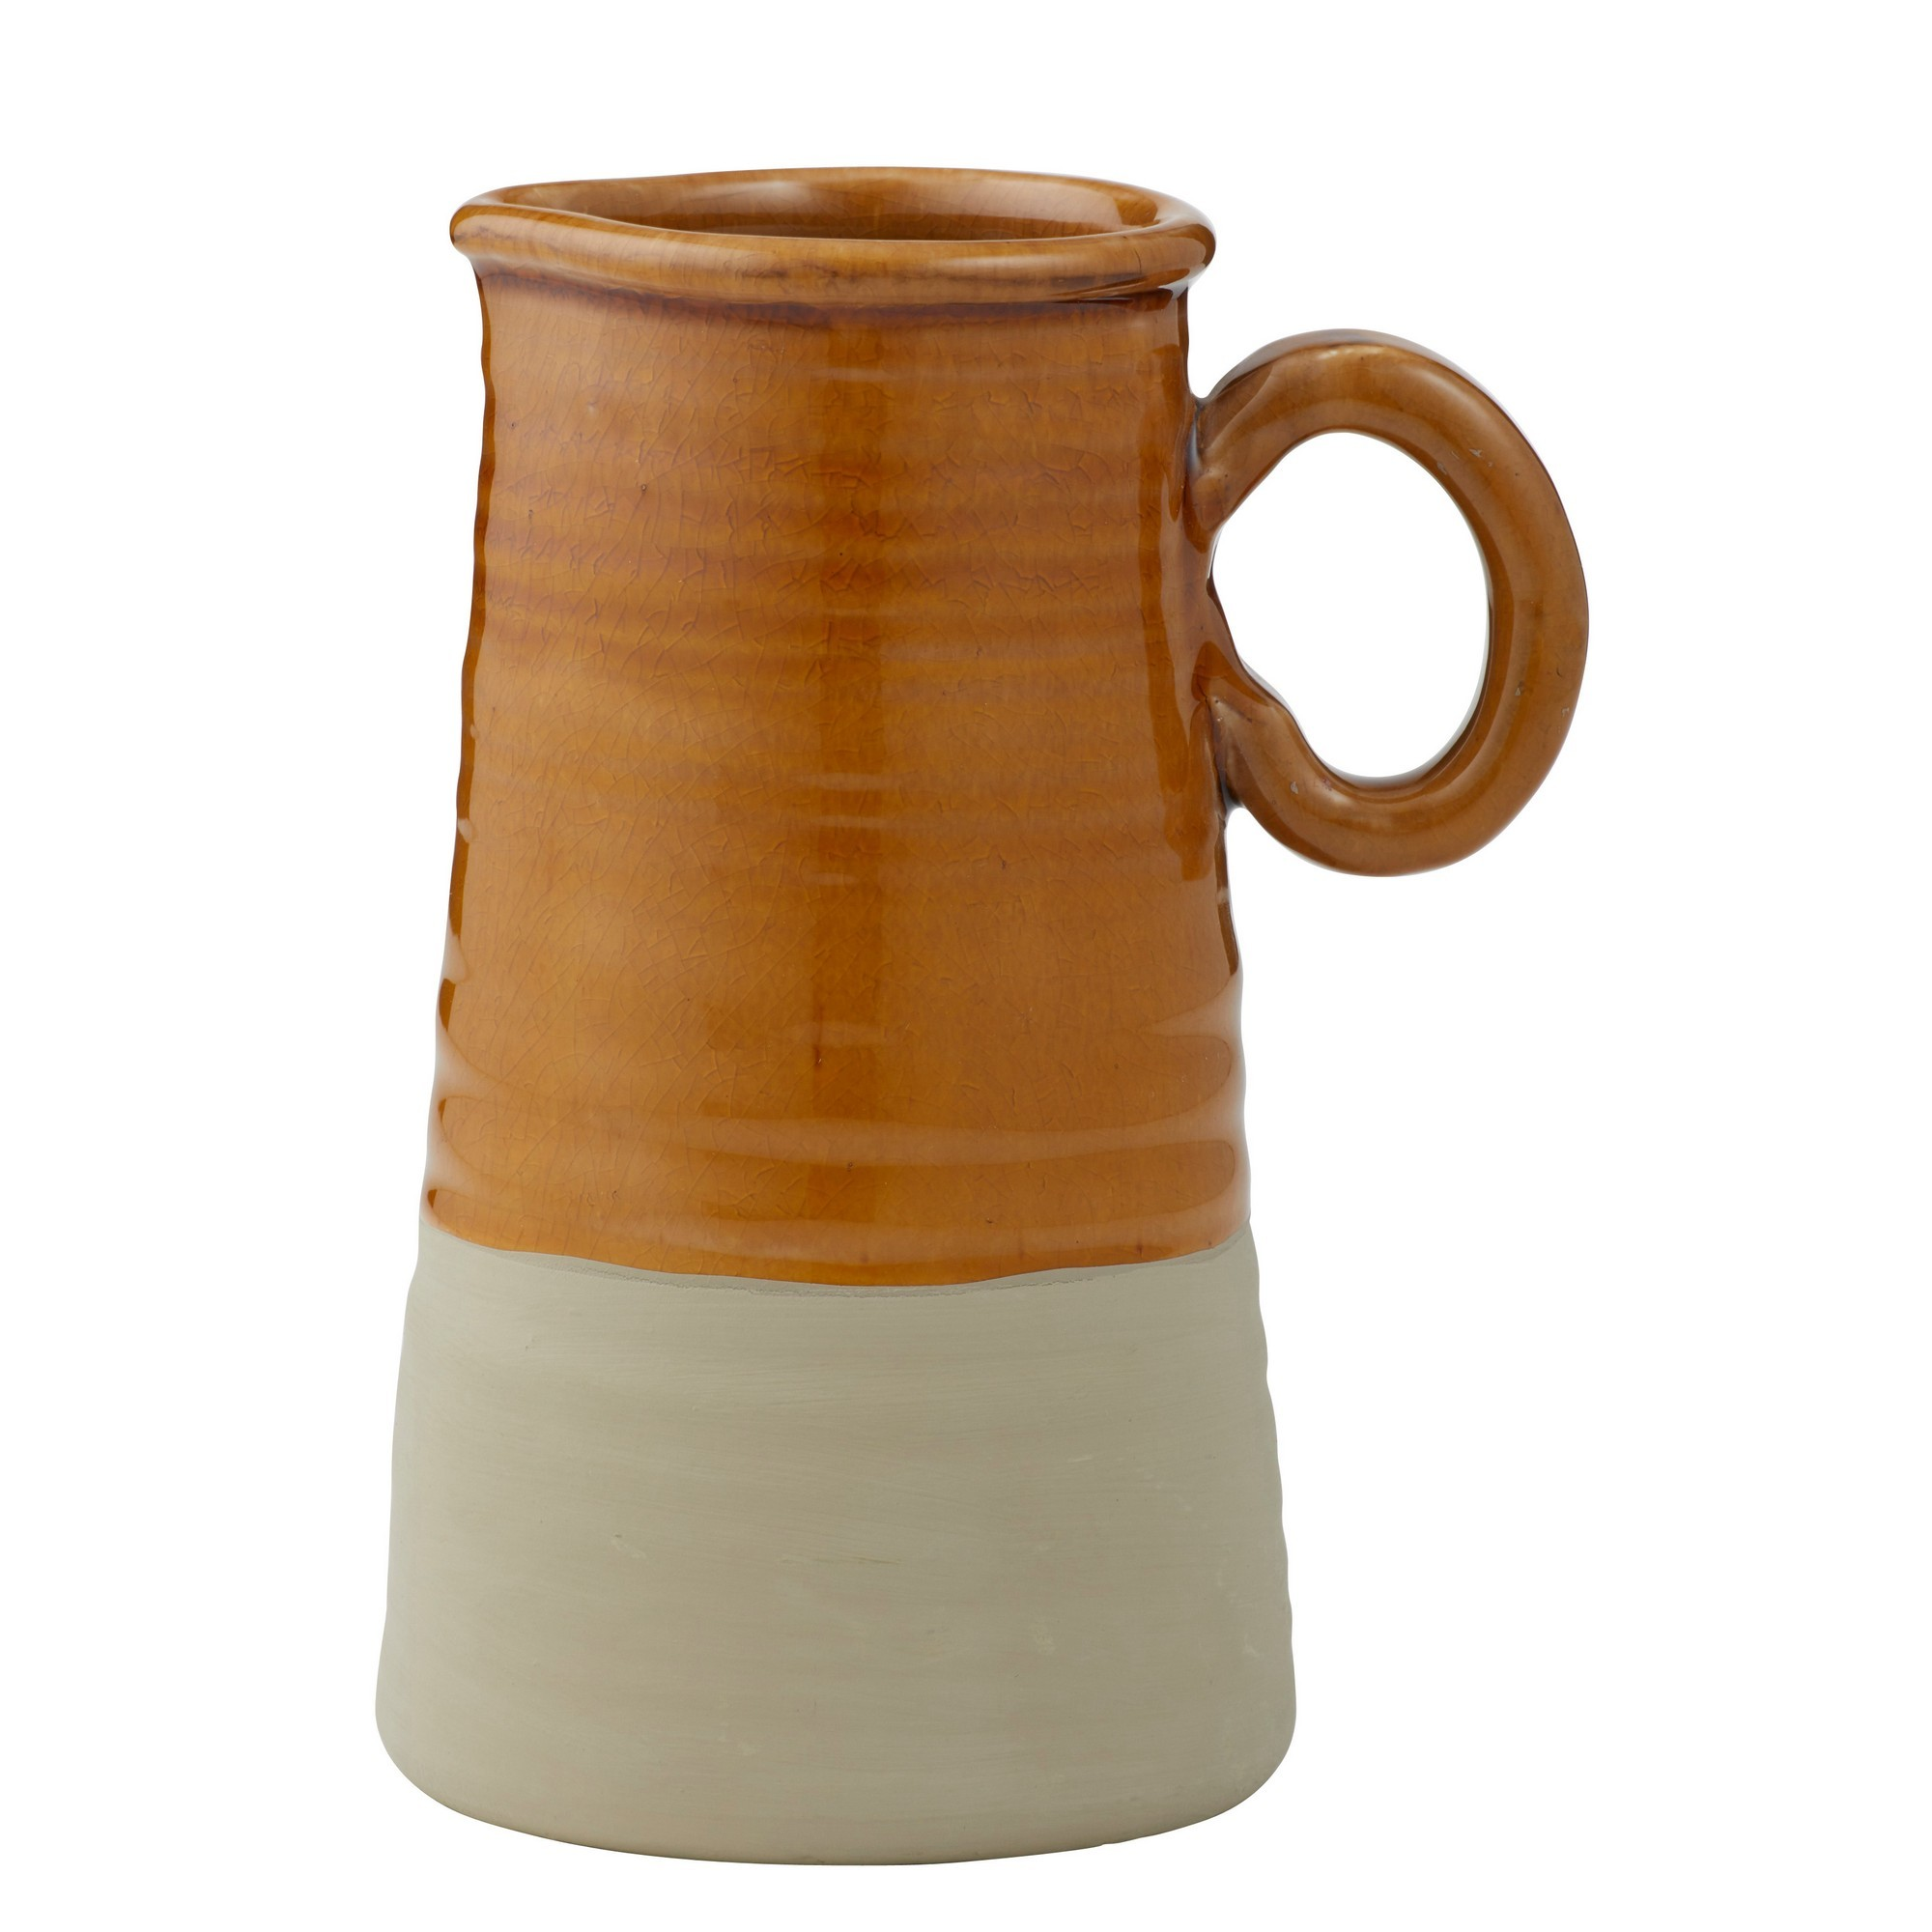 Poe Terracotta Pitcher Vase